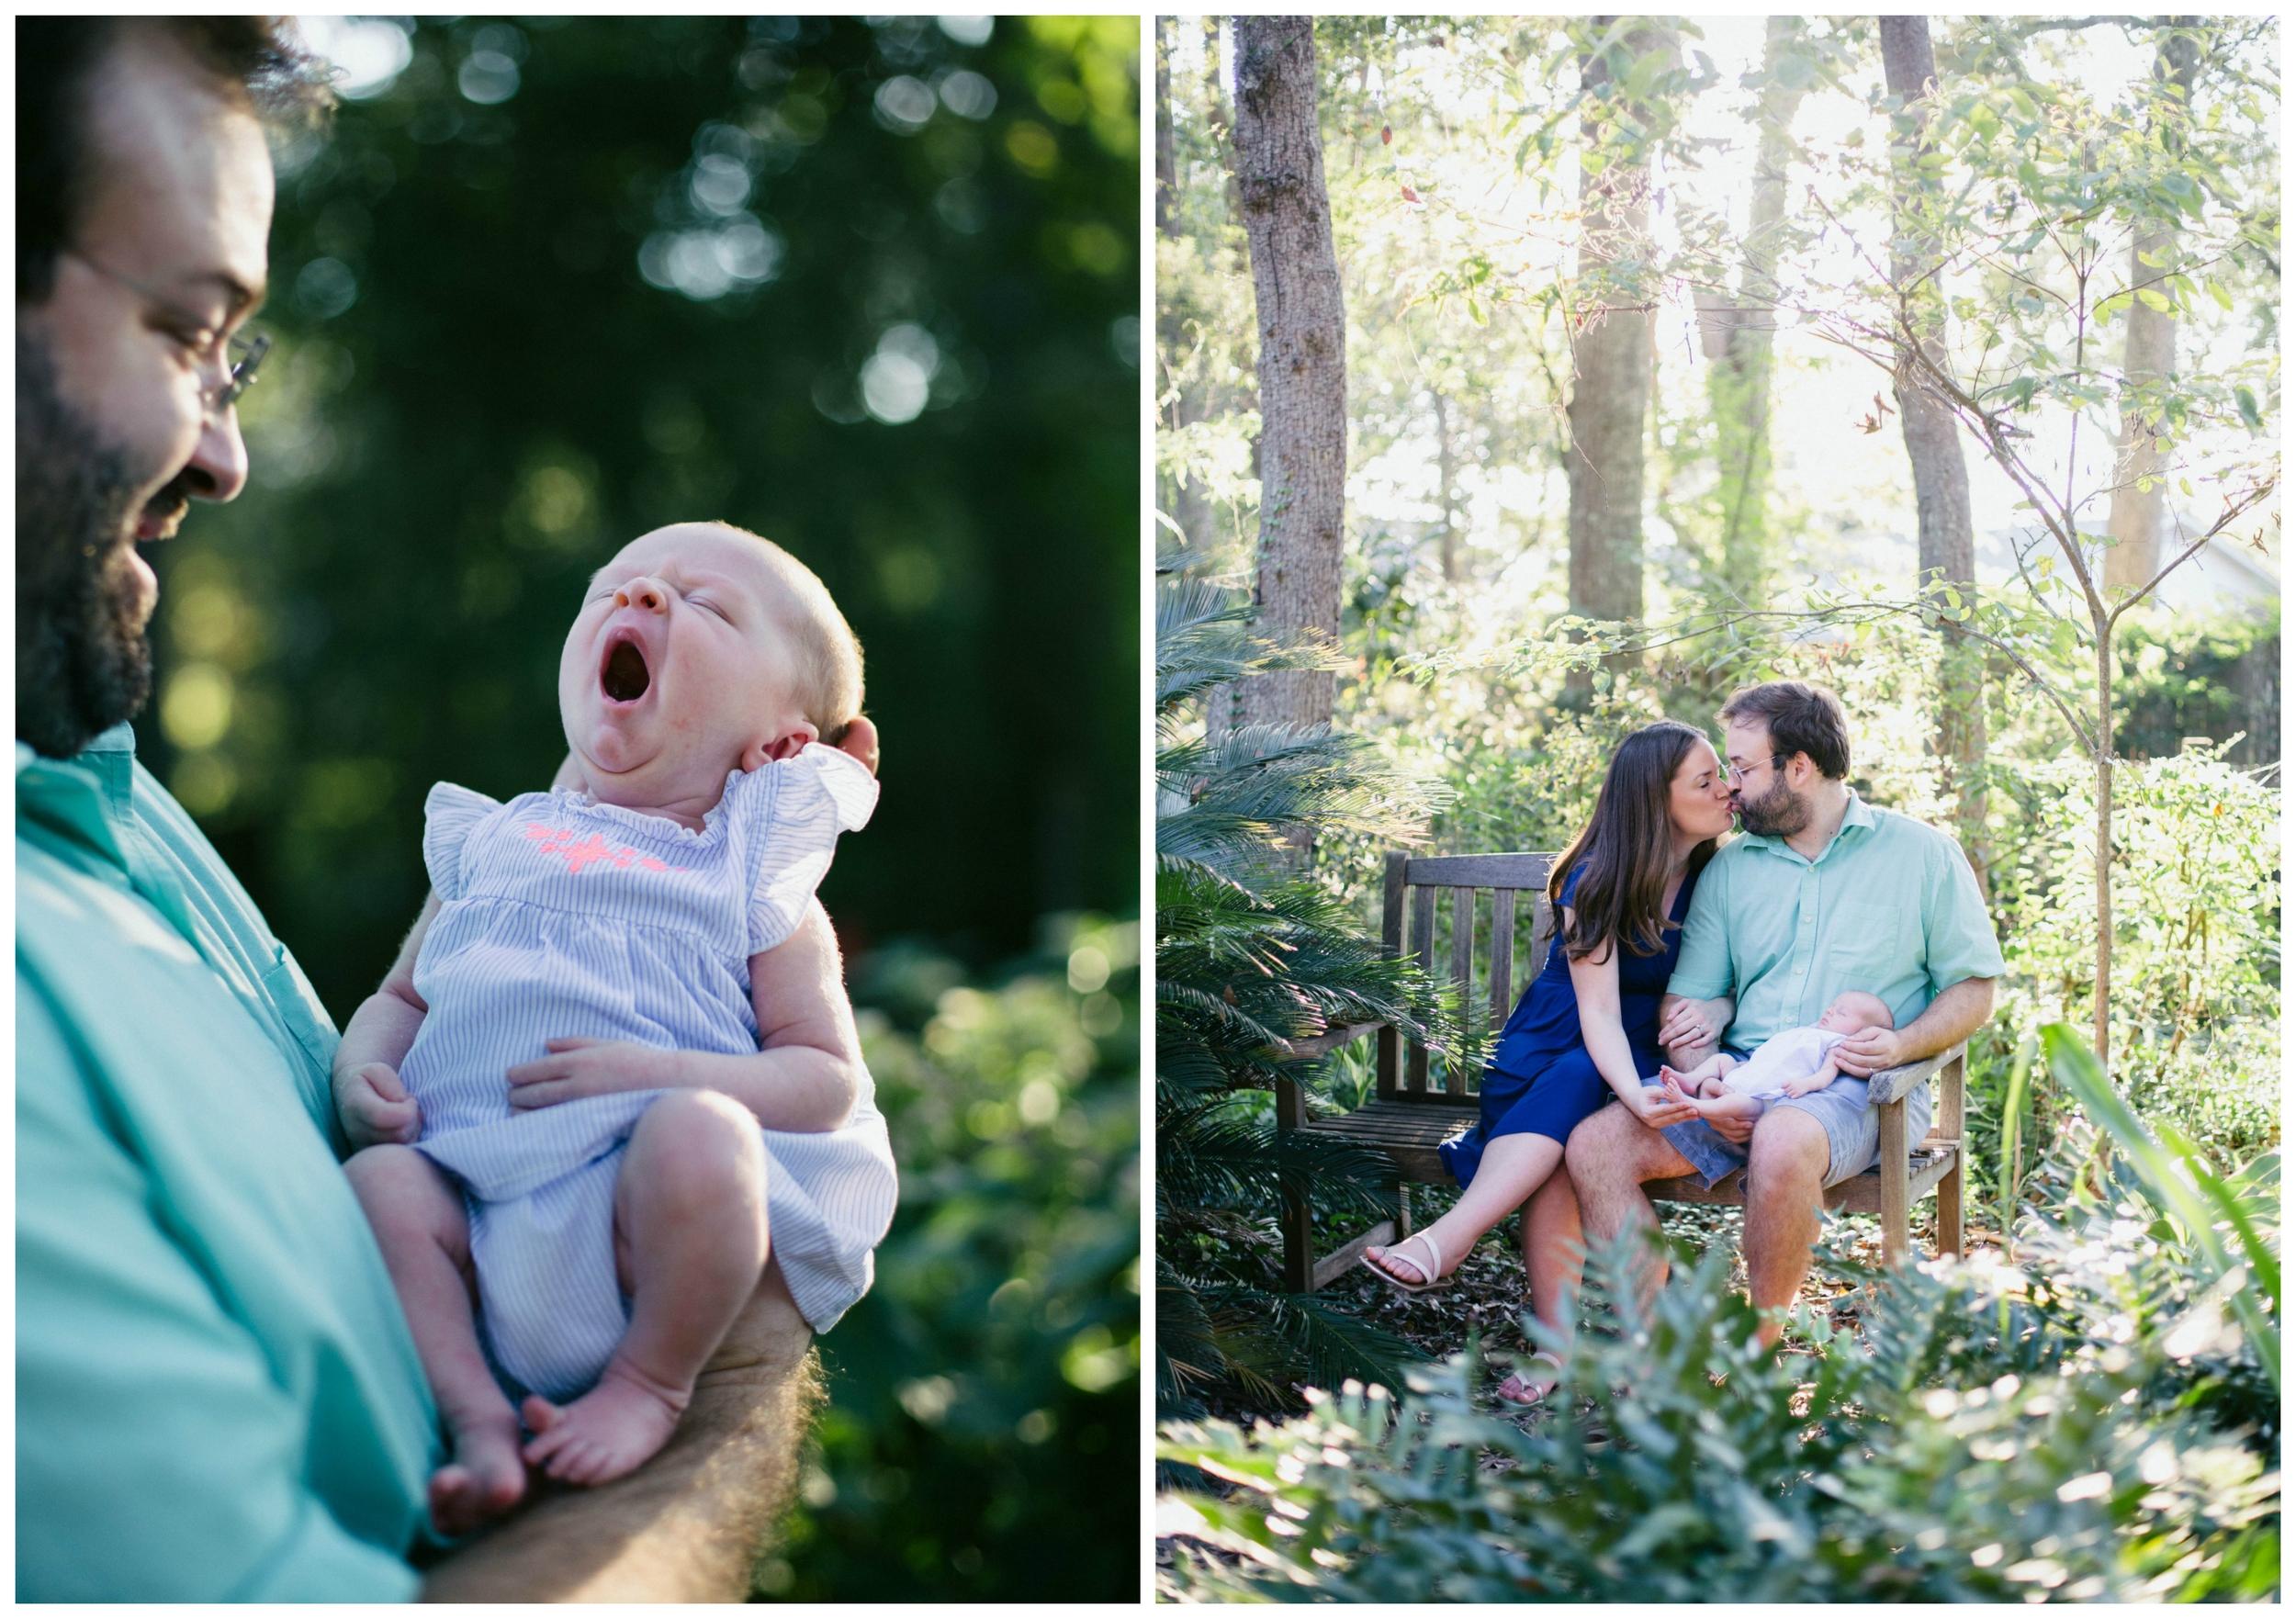 newborn baby girl yawning outdoos